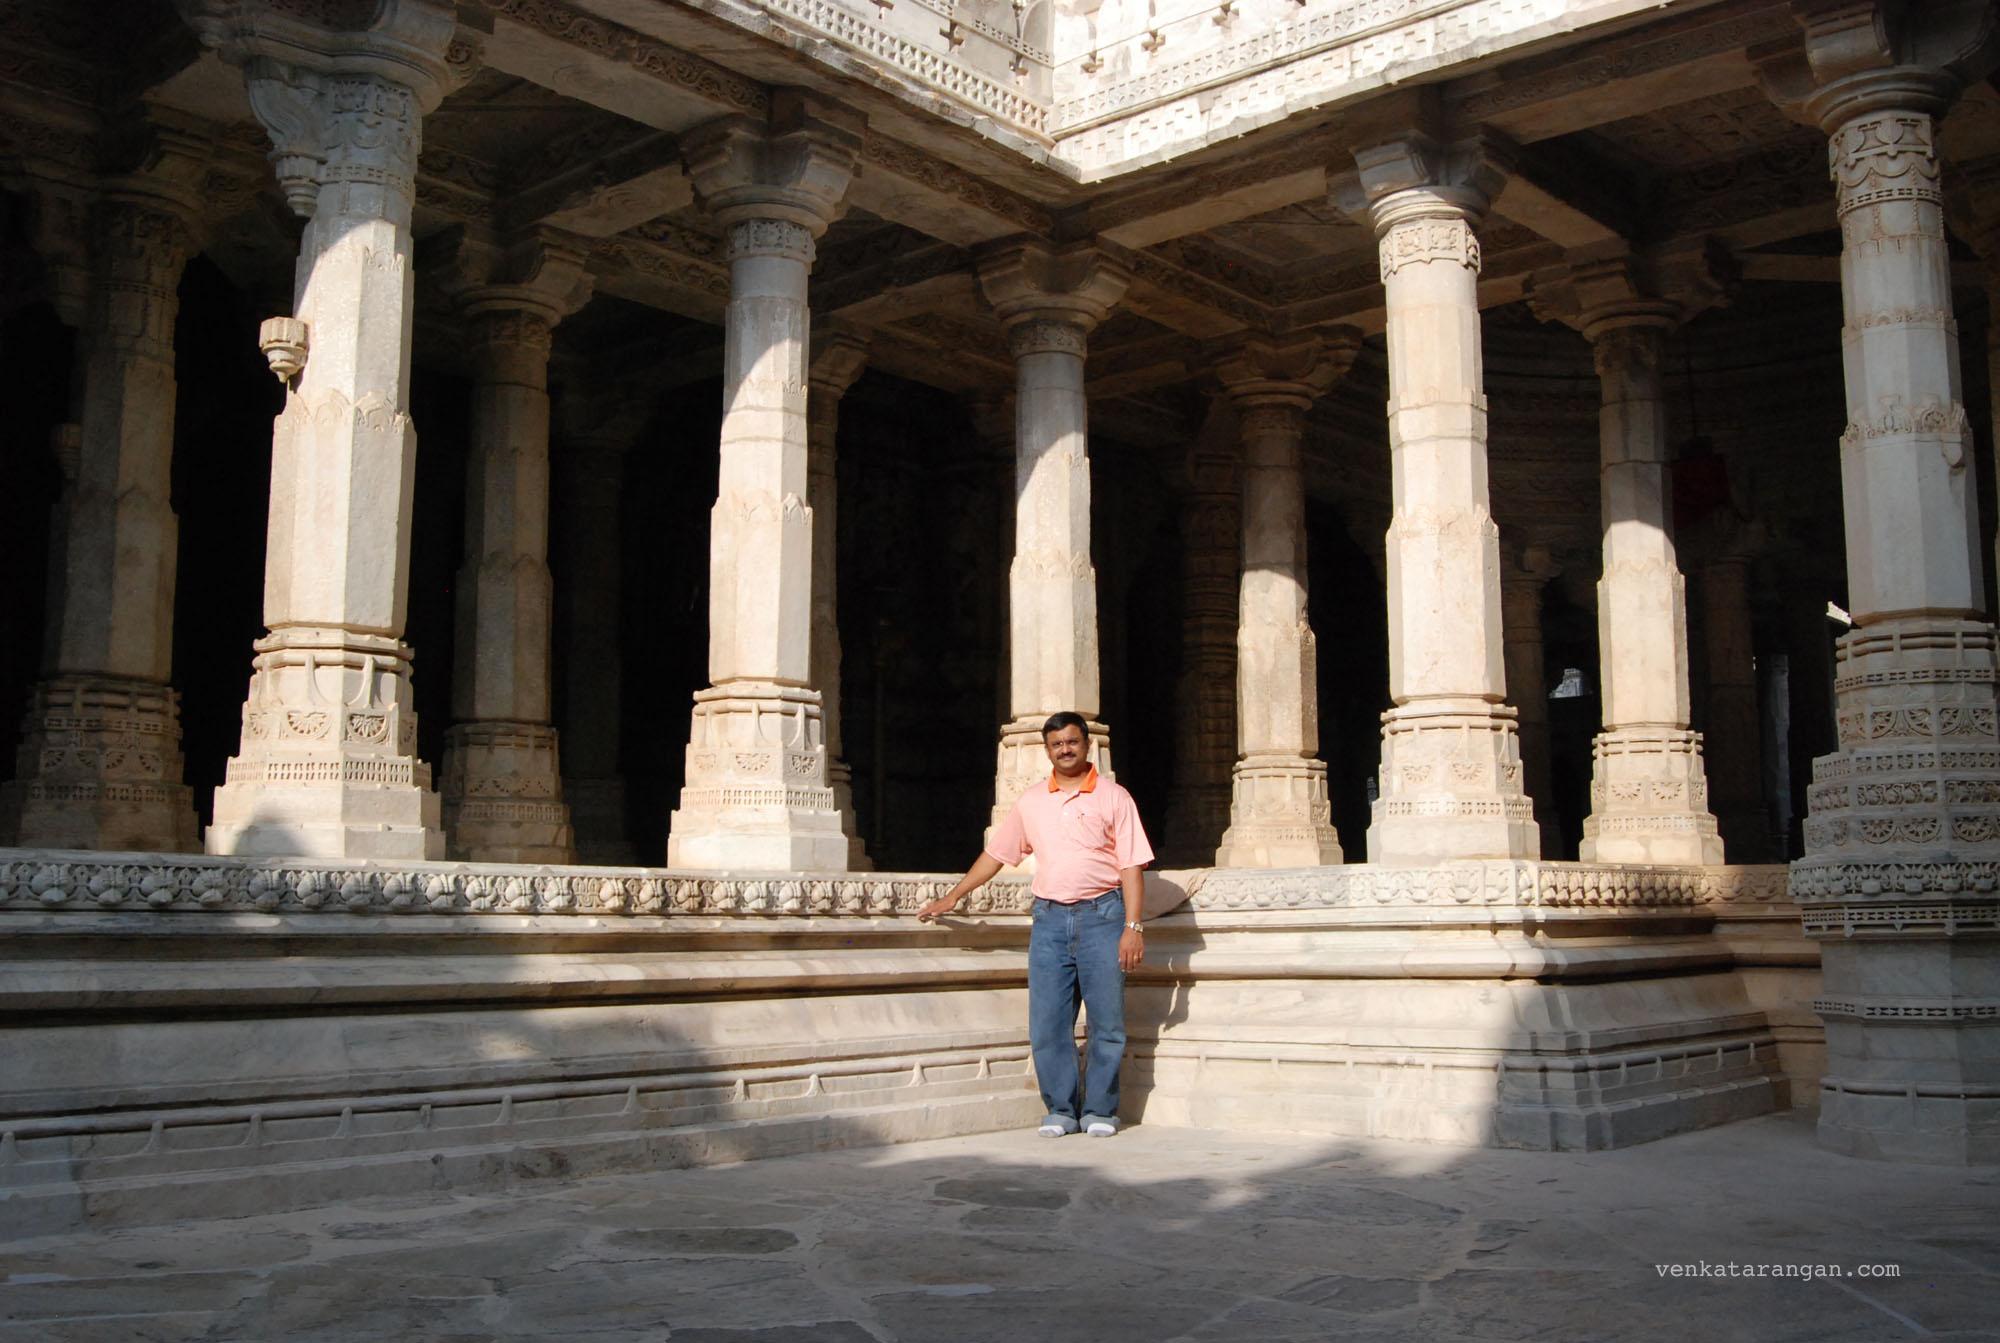 Venkatarangan in Ranakpur Jain Temple